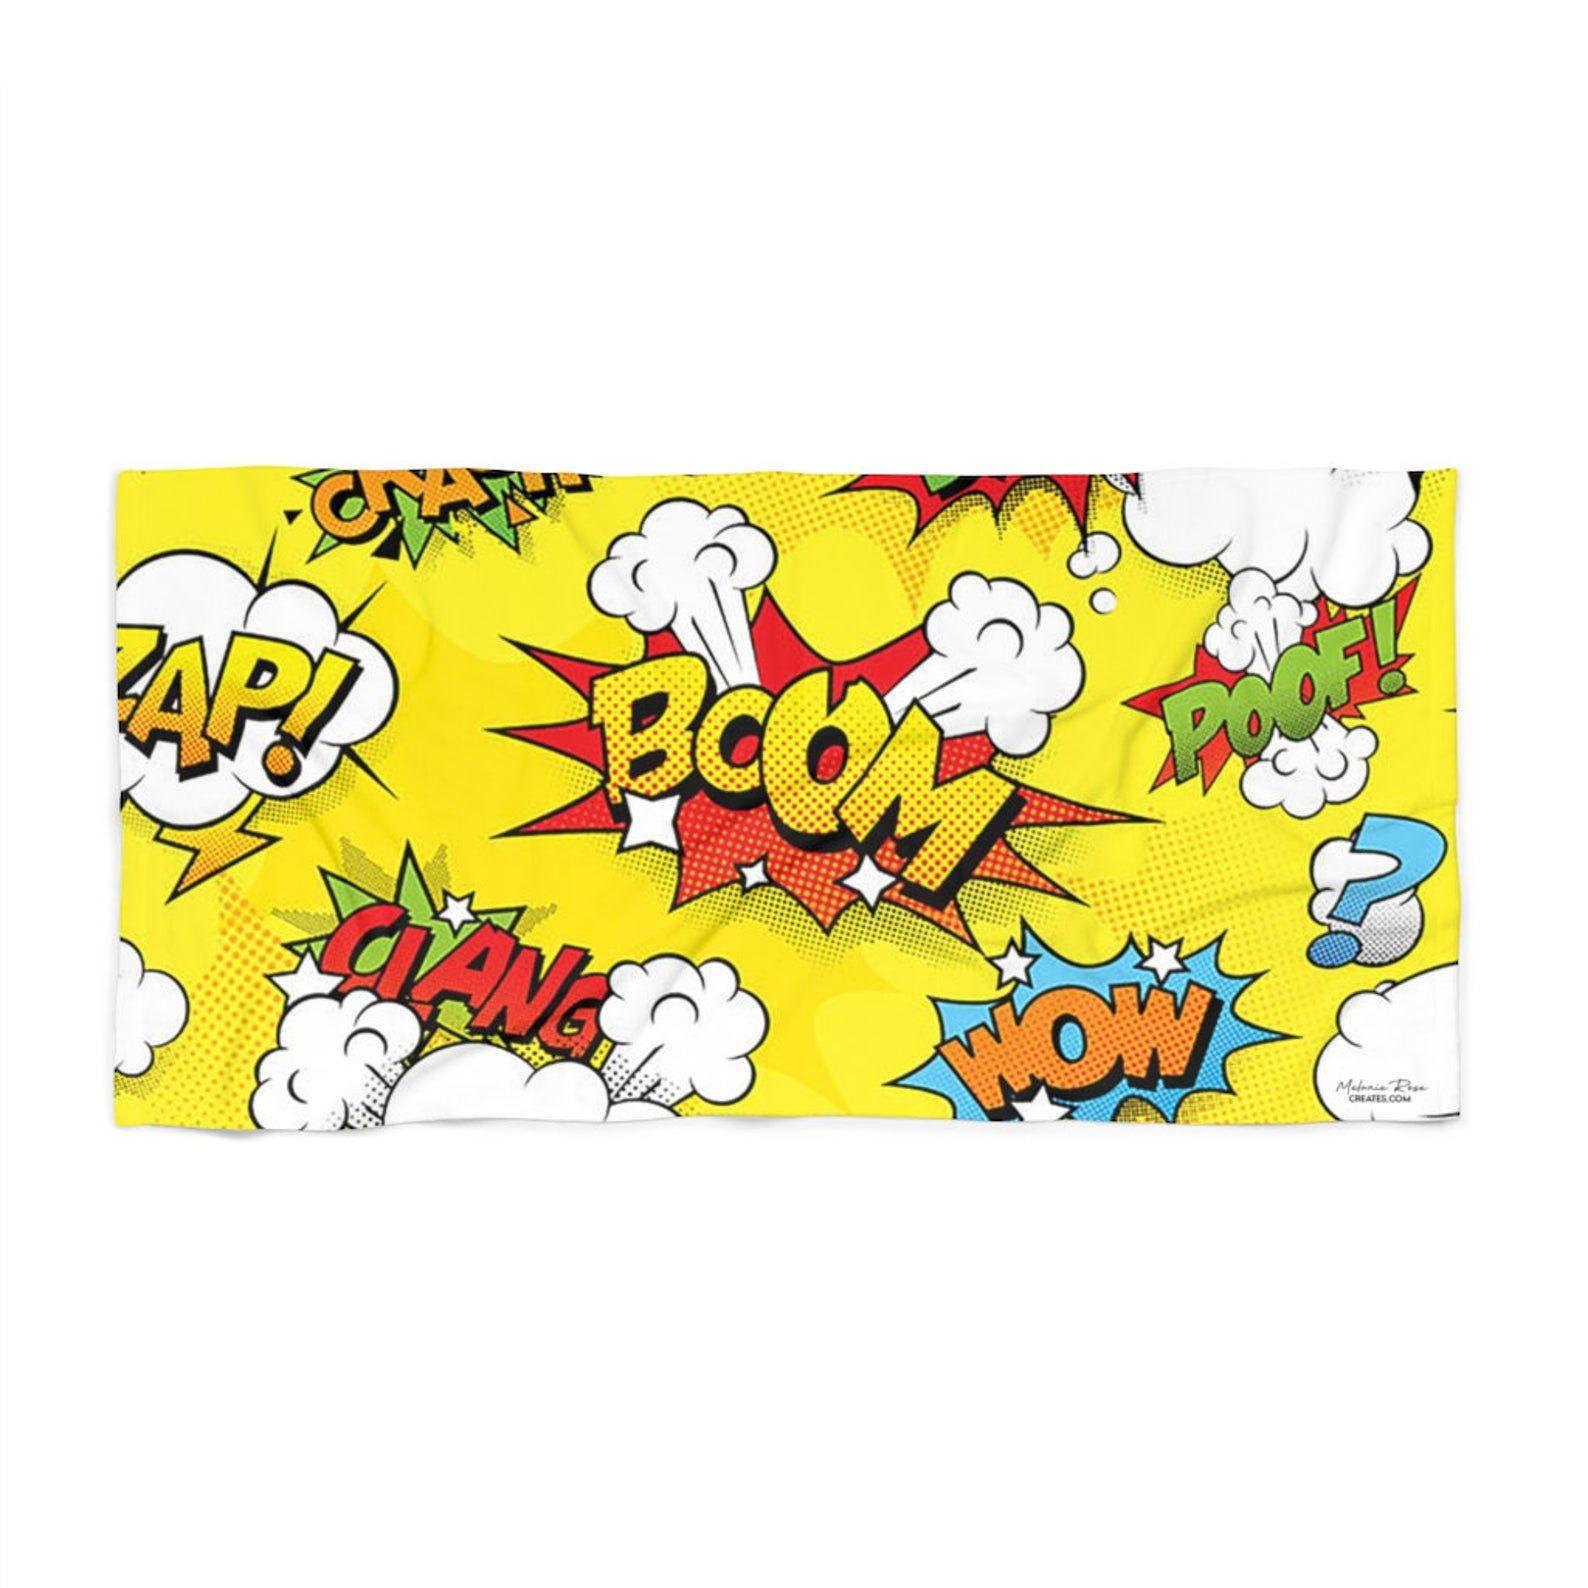 Cartoon Sound Effects Printed Towel